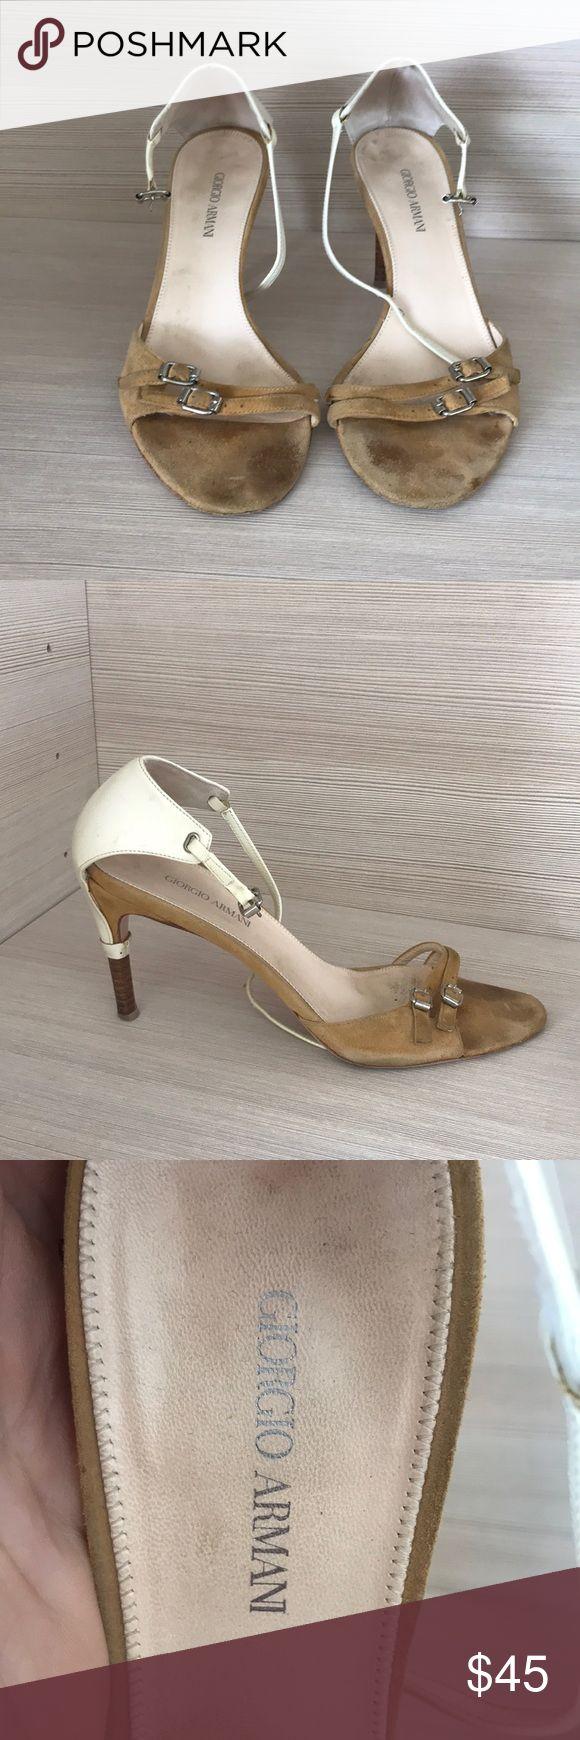 Georgio Armani heels White and beige short healed GIORGIO ARMANI shoes size 37.5 Giorgio Armani Shoes Heels